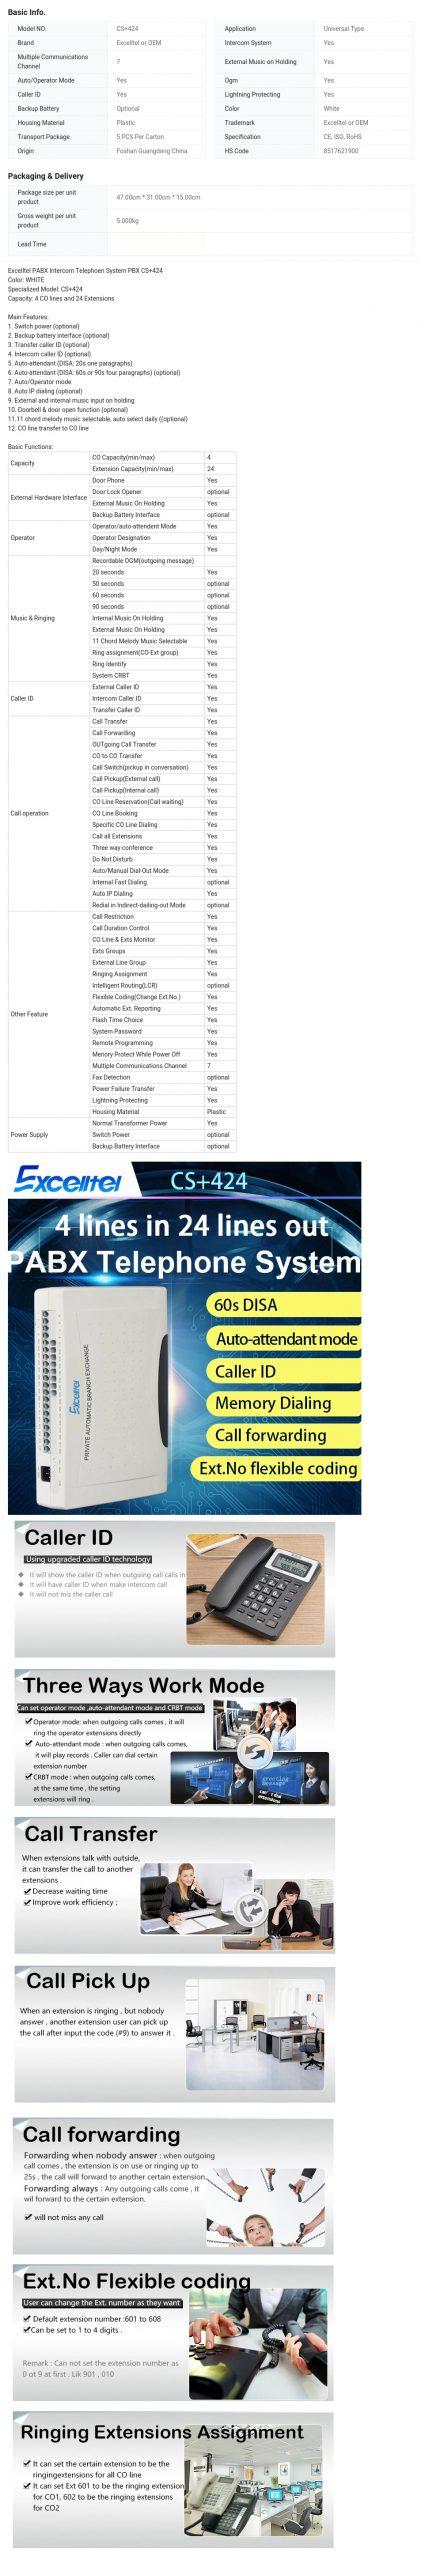 Excelltel PABX System 4Co Line 24 Extension